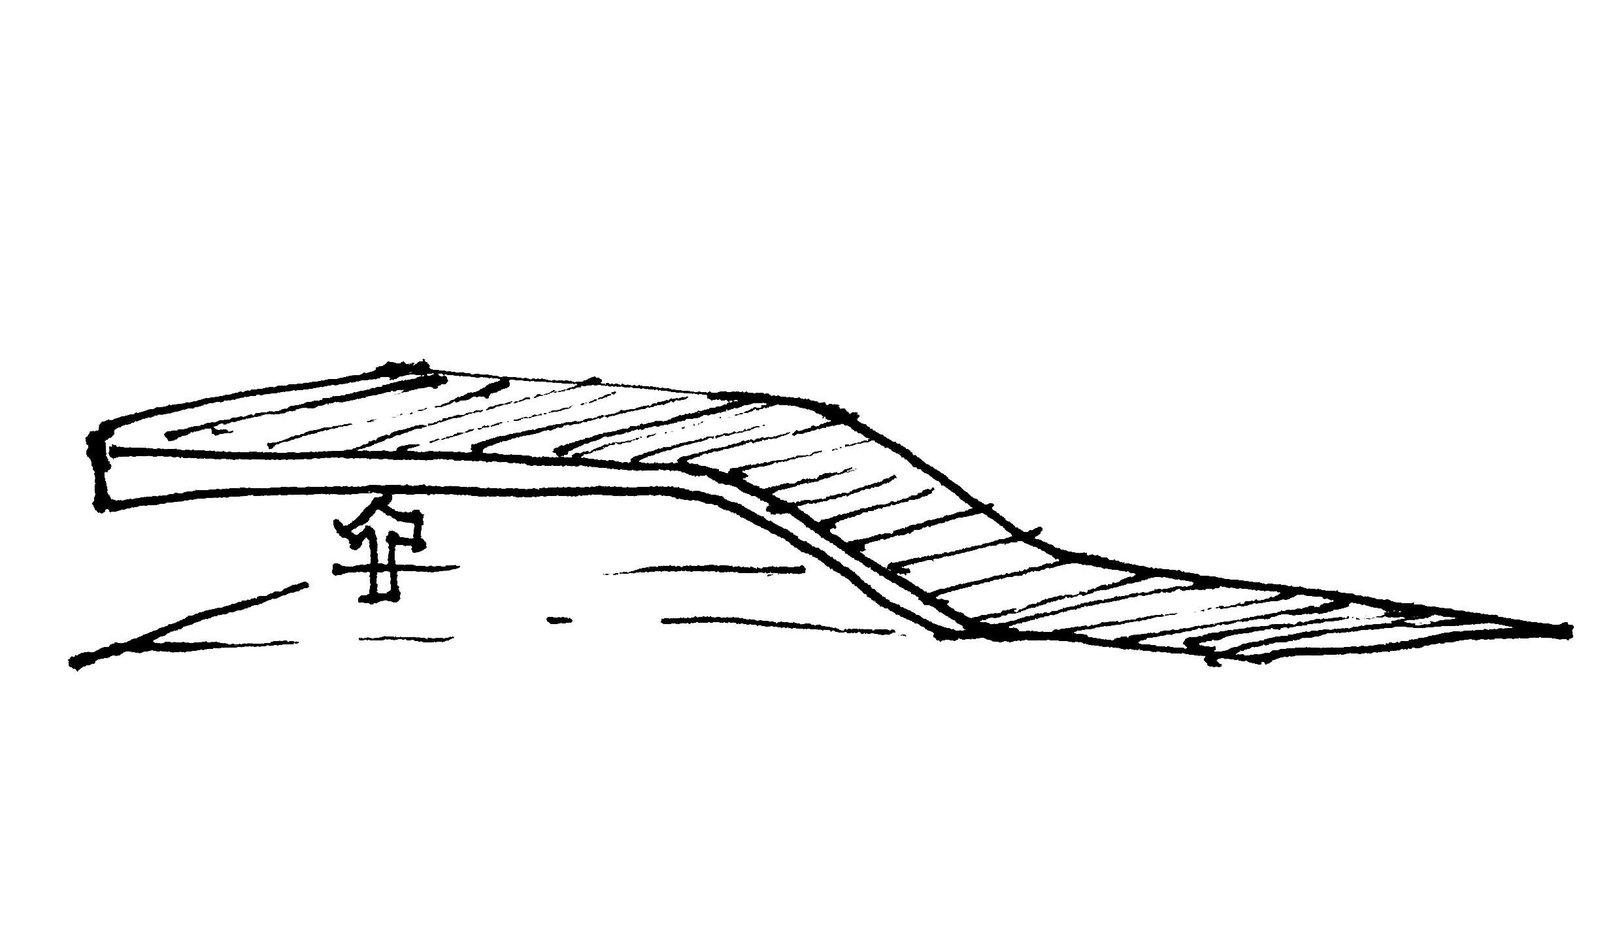 Photo 5 of 7 in Napkin Sketches